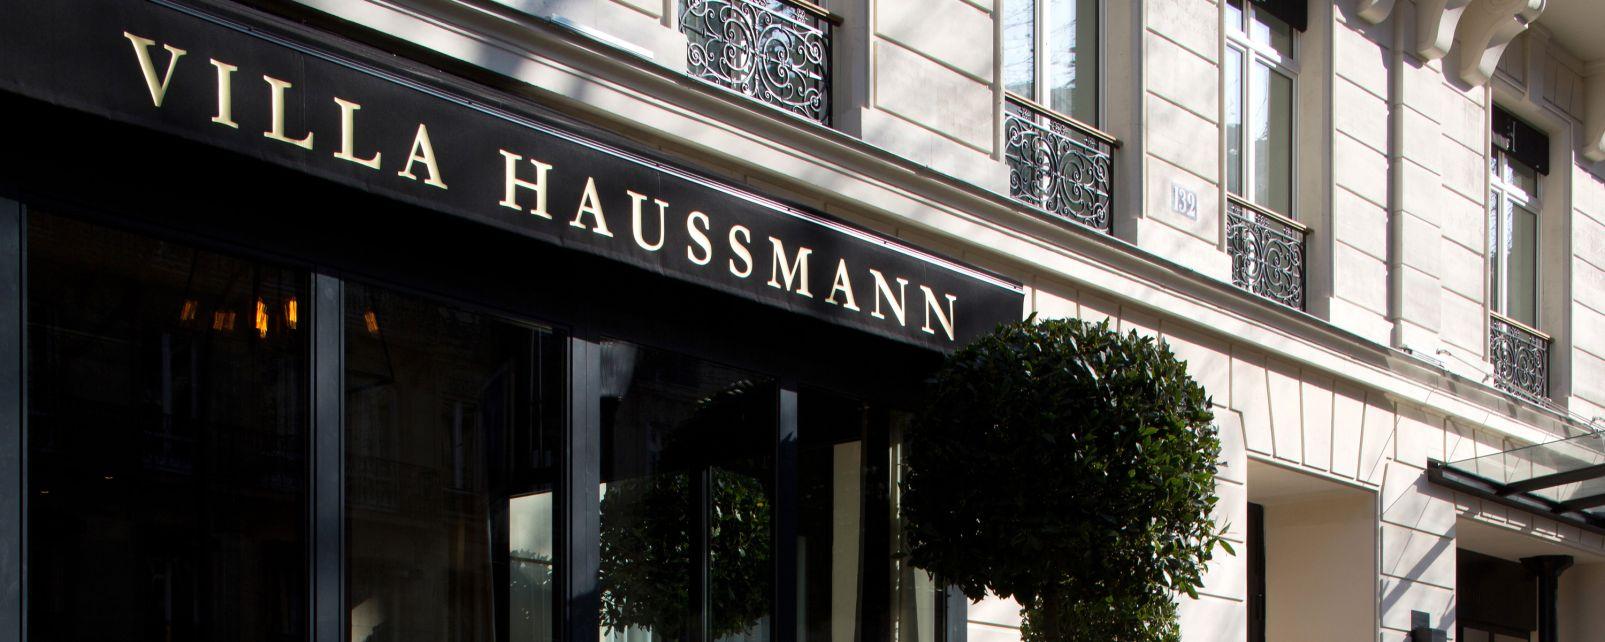 Hôtel La Villa Haussmann